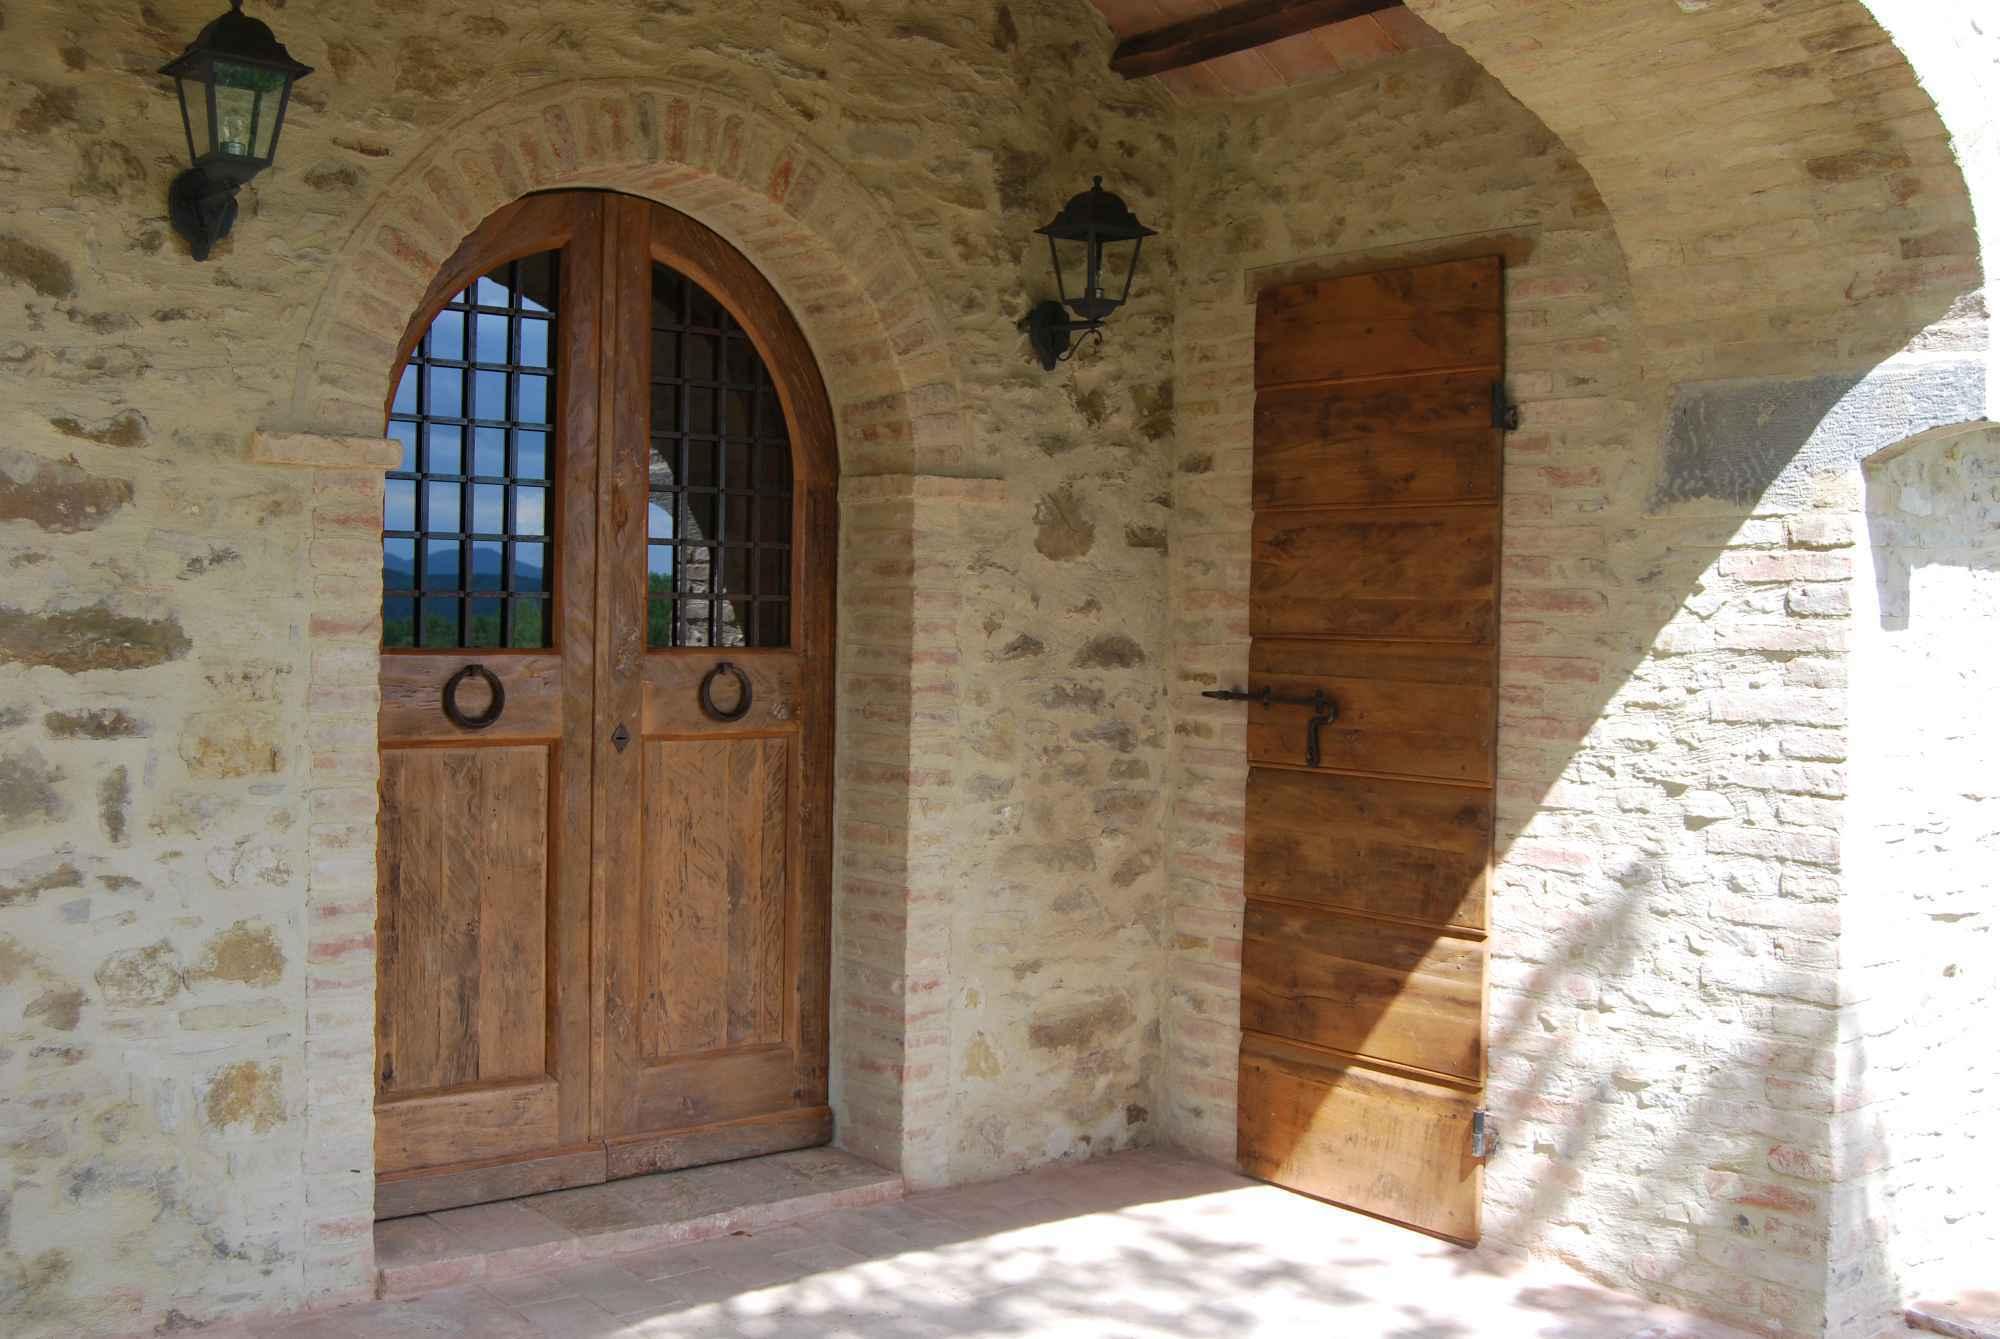 Favoloso Idee Arredamento Casa & Interior Design | homify YL54